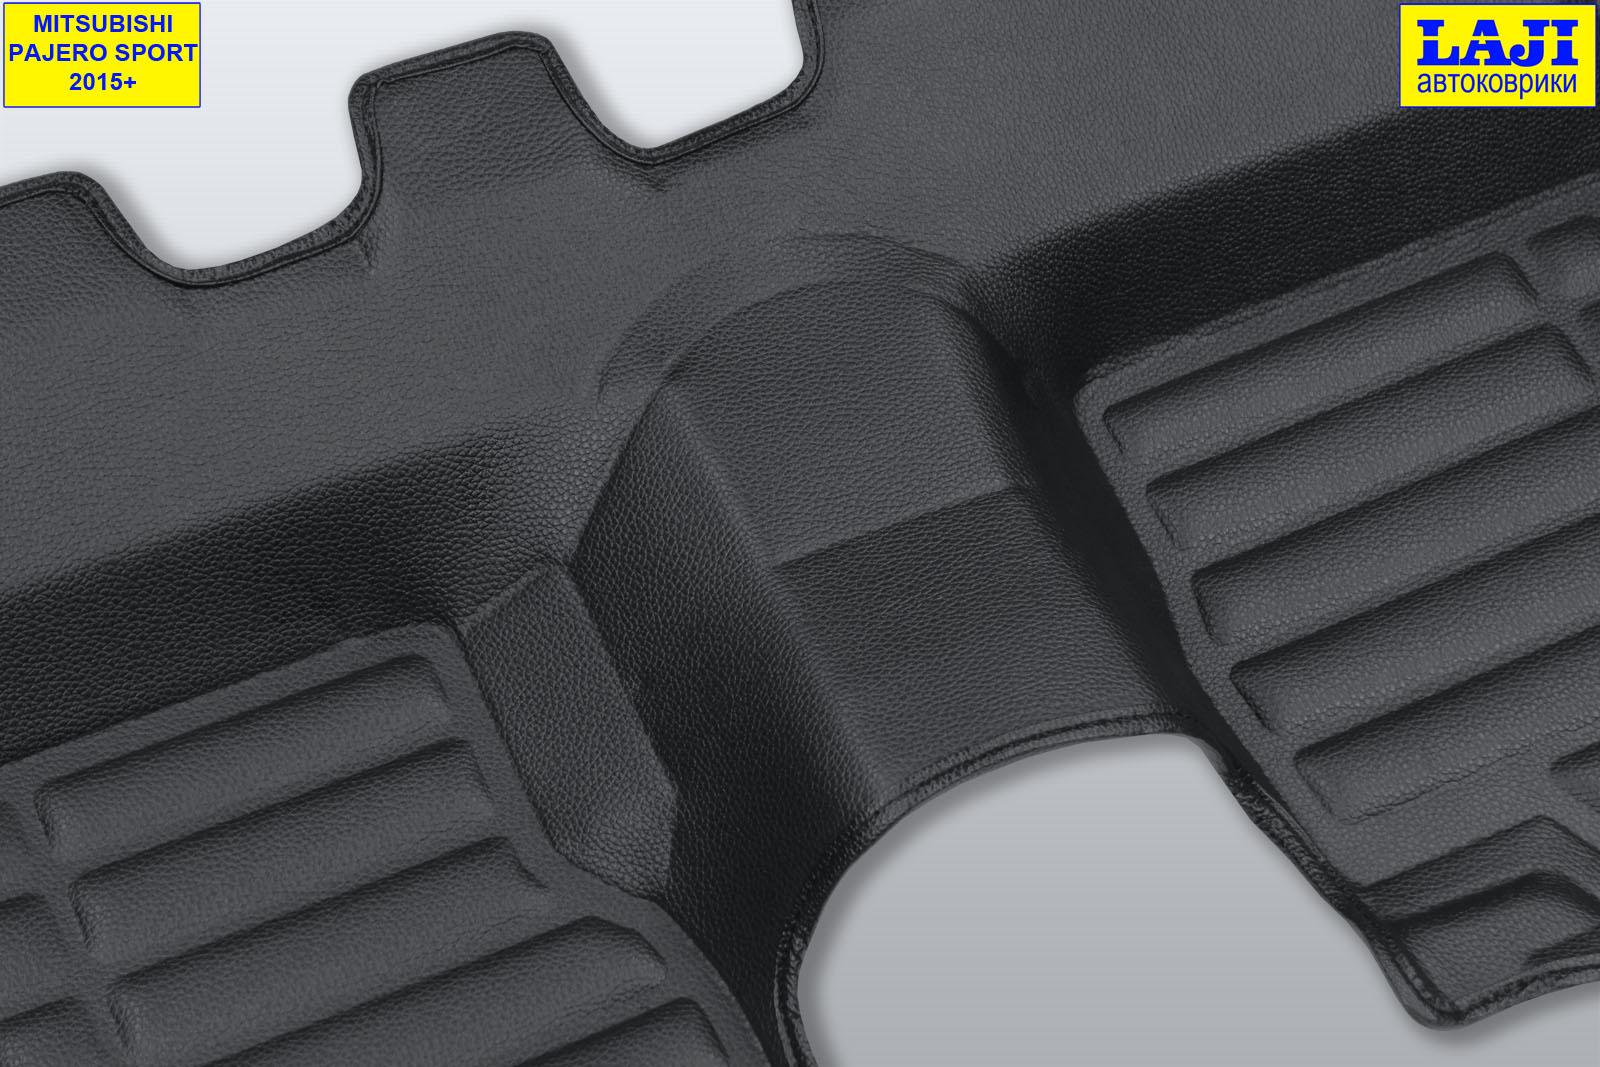 5D коврики в салон Mitsubishi Pajero Sport III 2015-н.в.